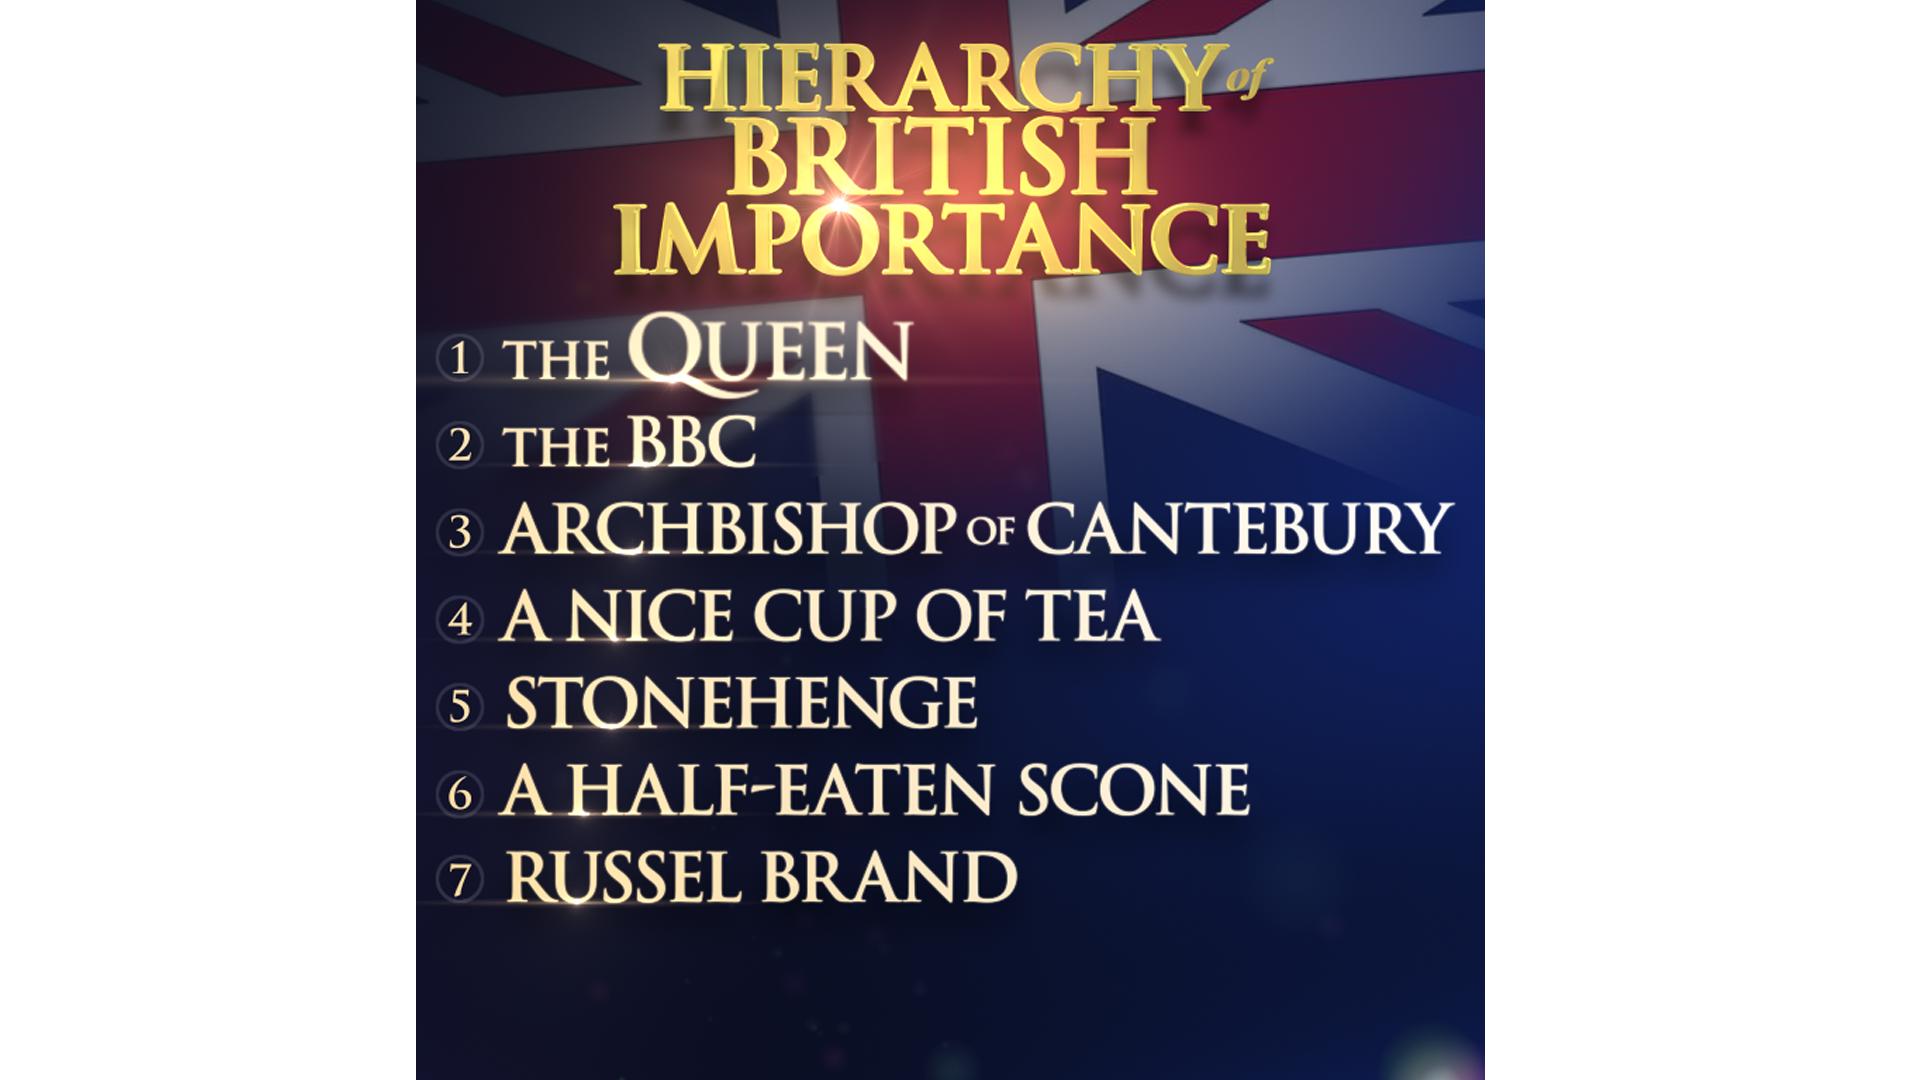 HierarchyBritishImportance_OTS_REV.png